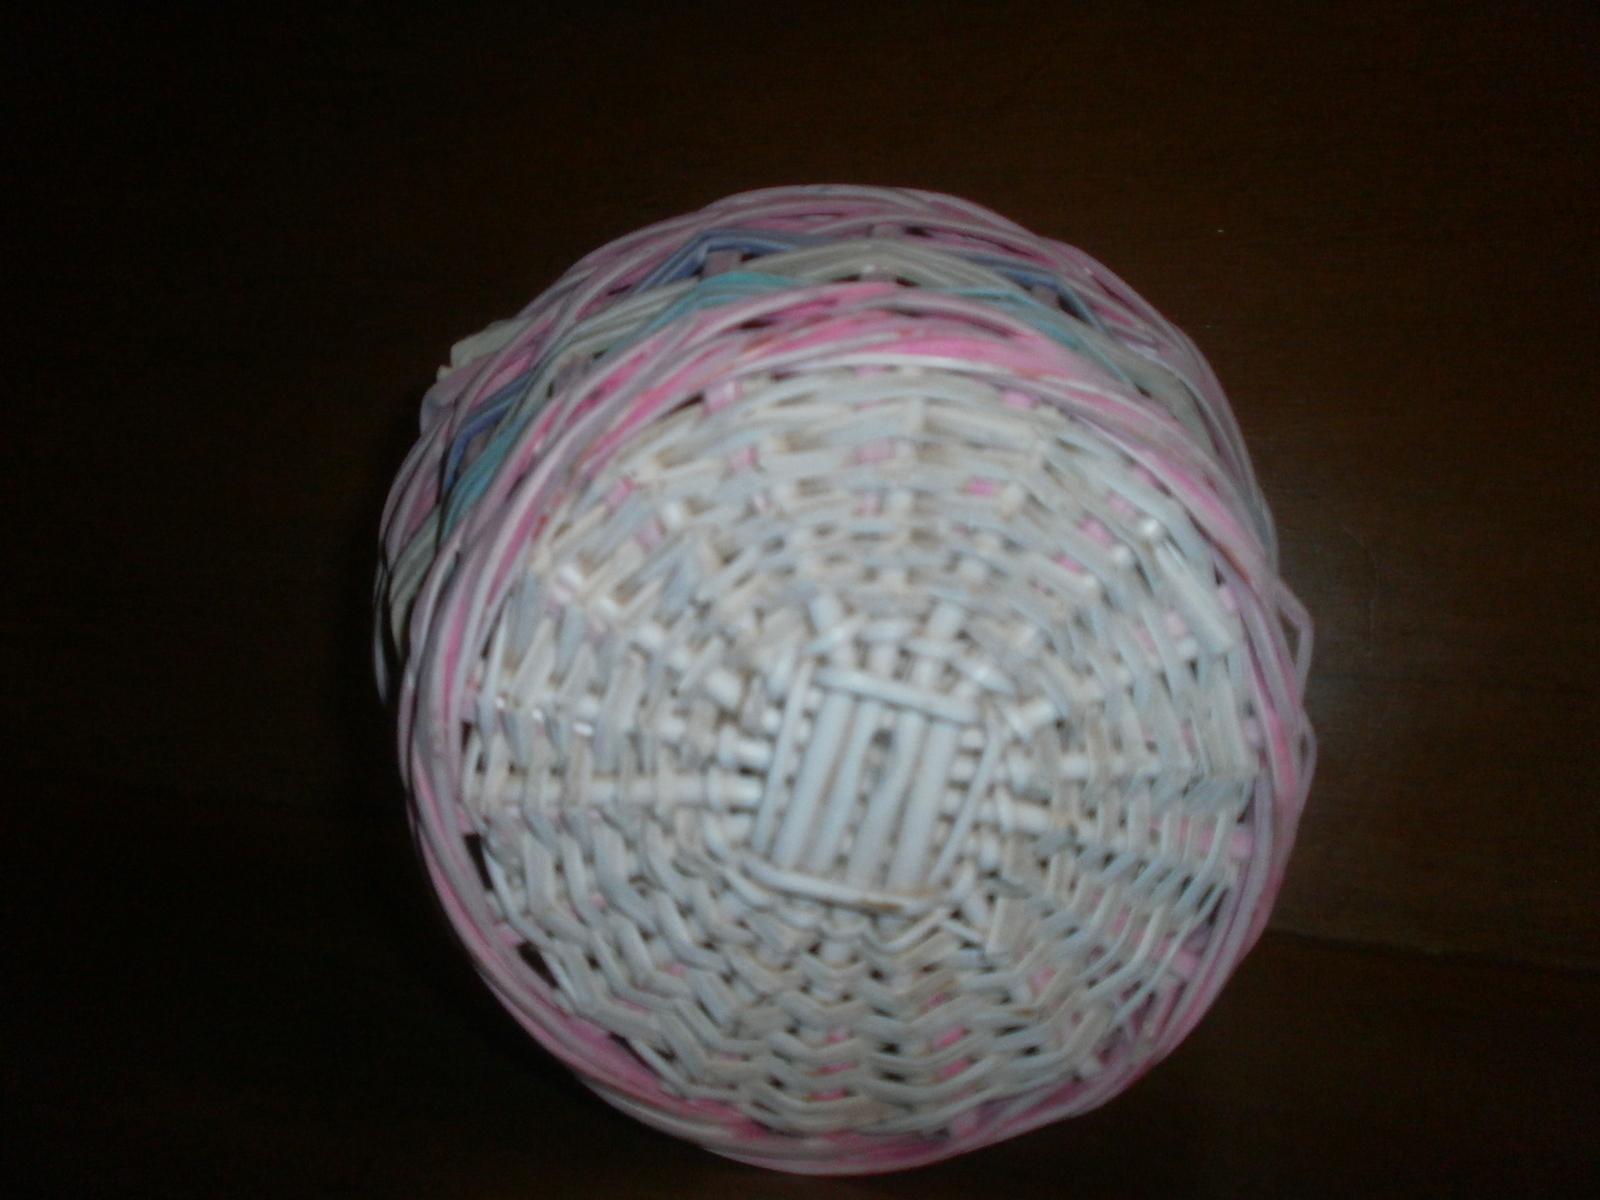 wicker basket white and pastel colors baskets. Black Bedroom Furniture Sets. Home Design Ideas